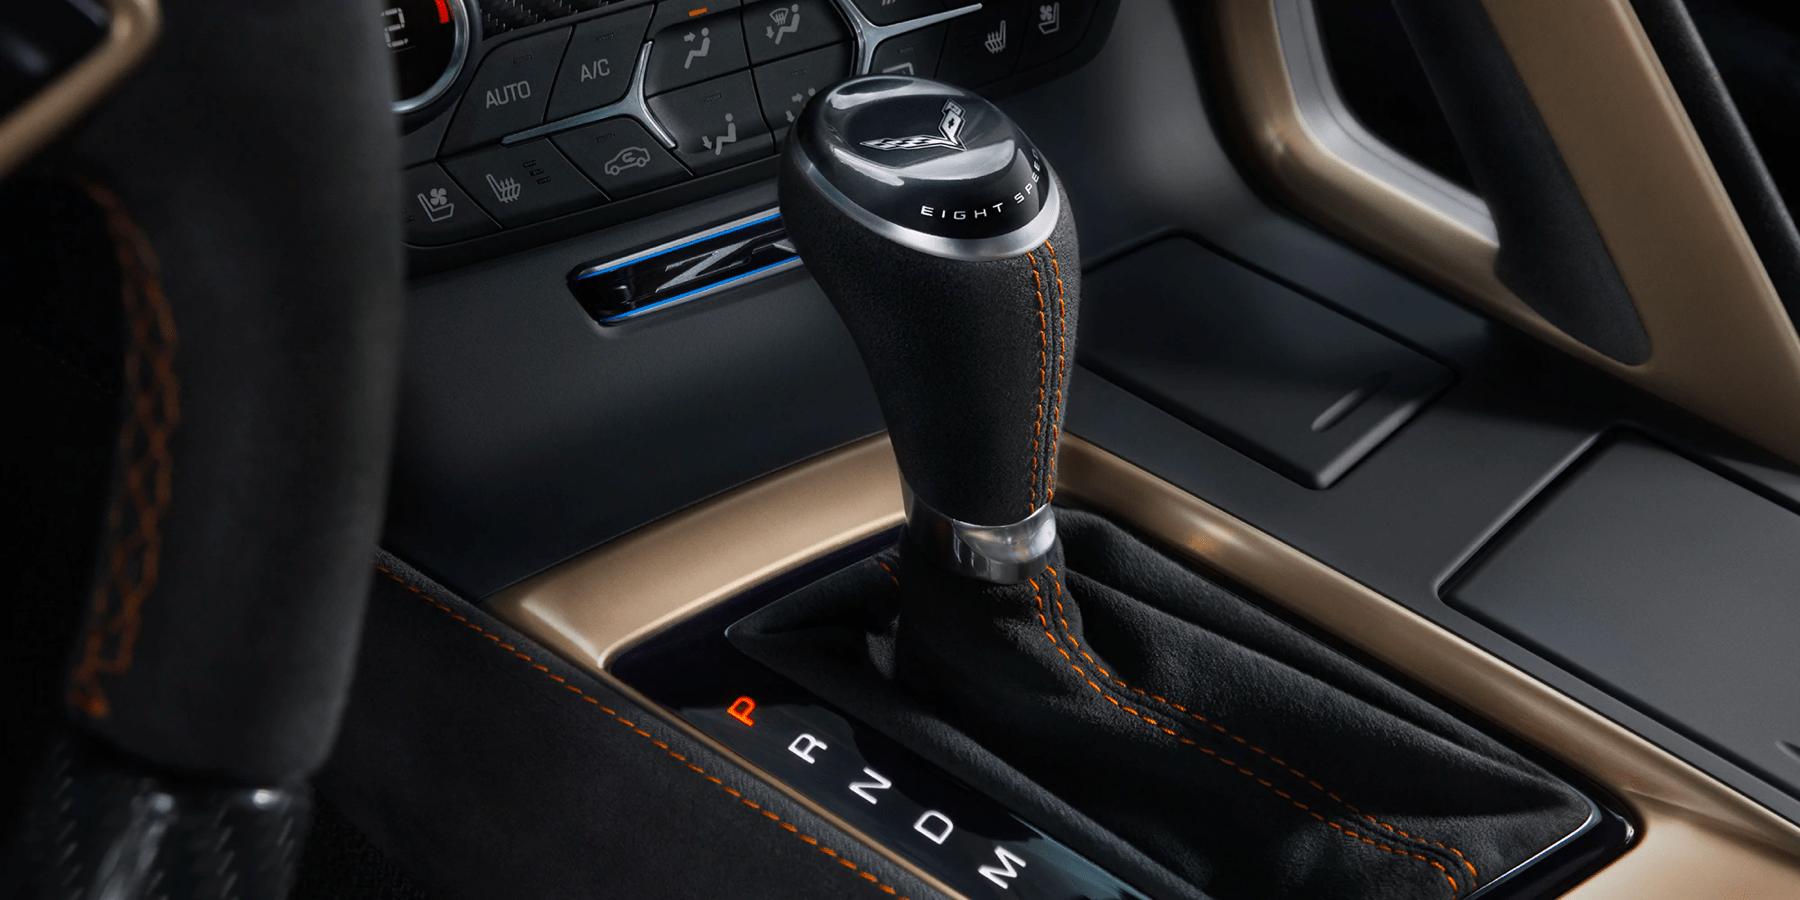 closeup view of stick shift of Corvette ZR1